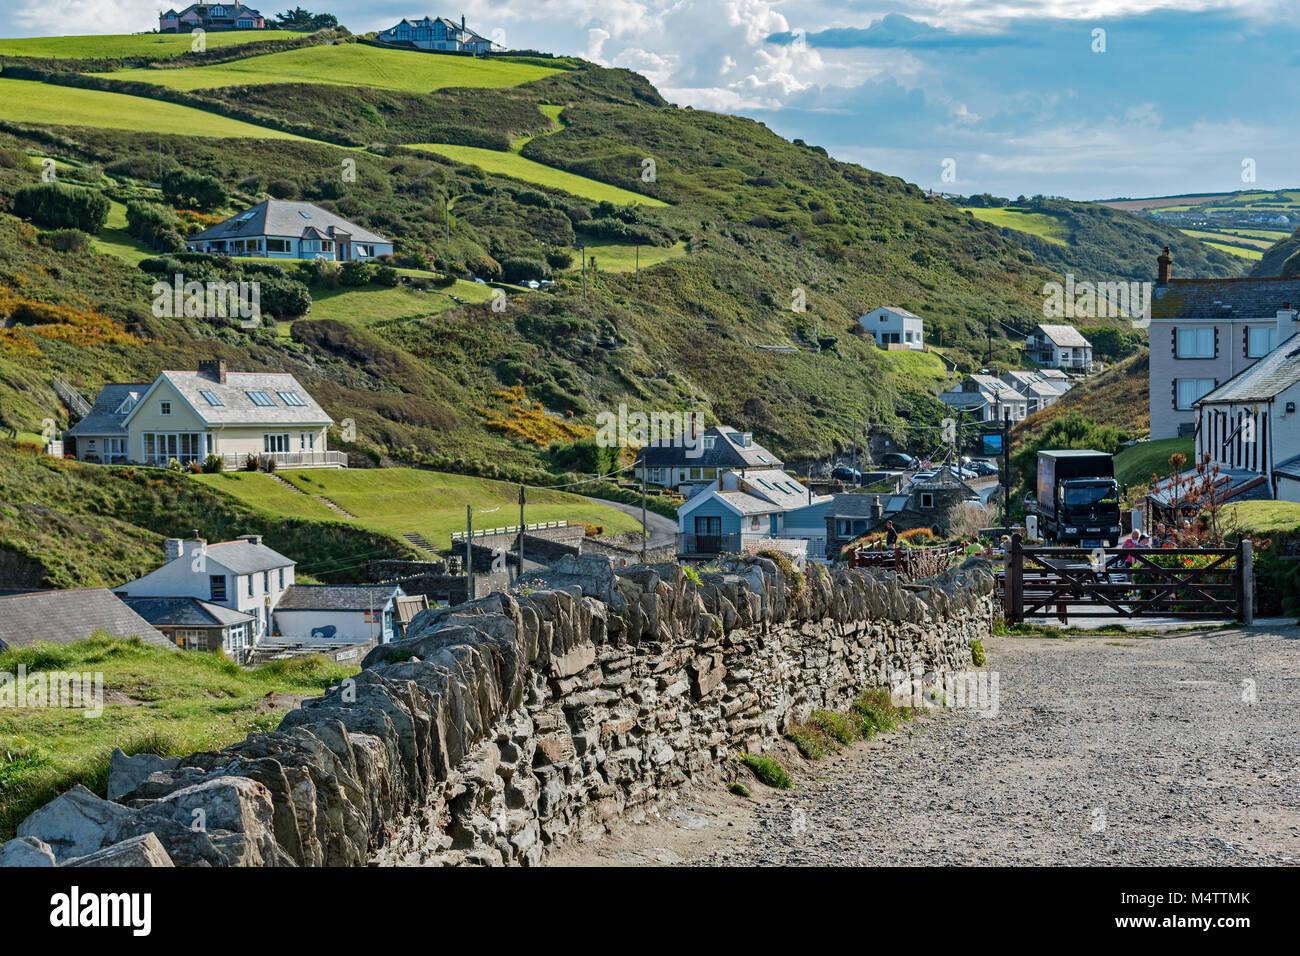 the village of trebarwith strand on the north coast of cornwall, england, britain, uk. - Stock Image